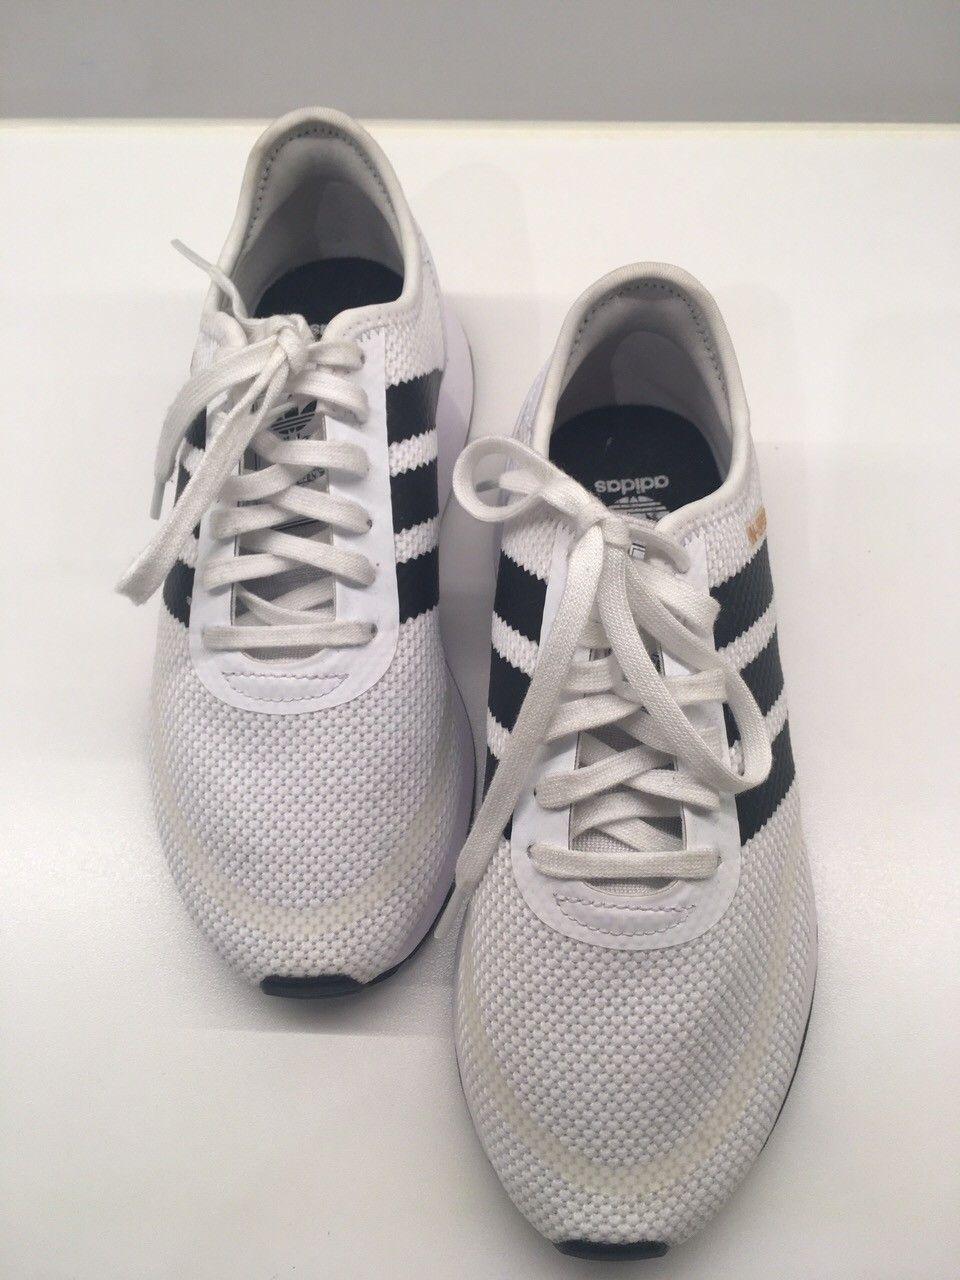 Adidas Ortholite sneakers str. 36,5   FINN.no